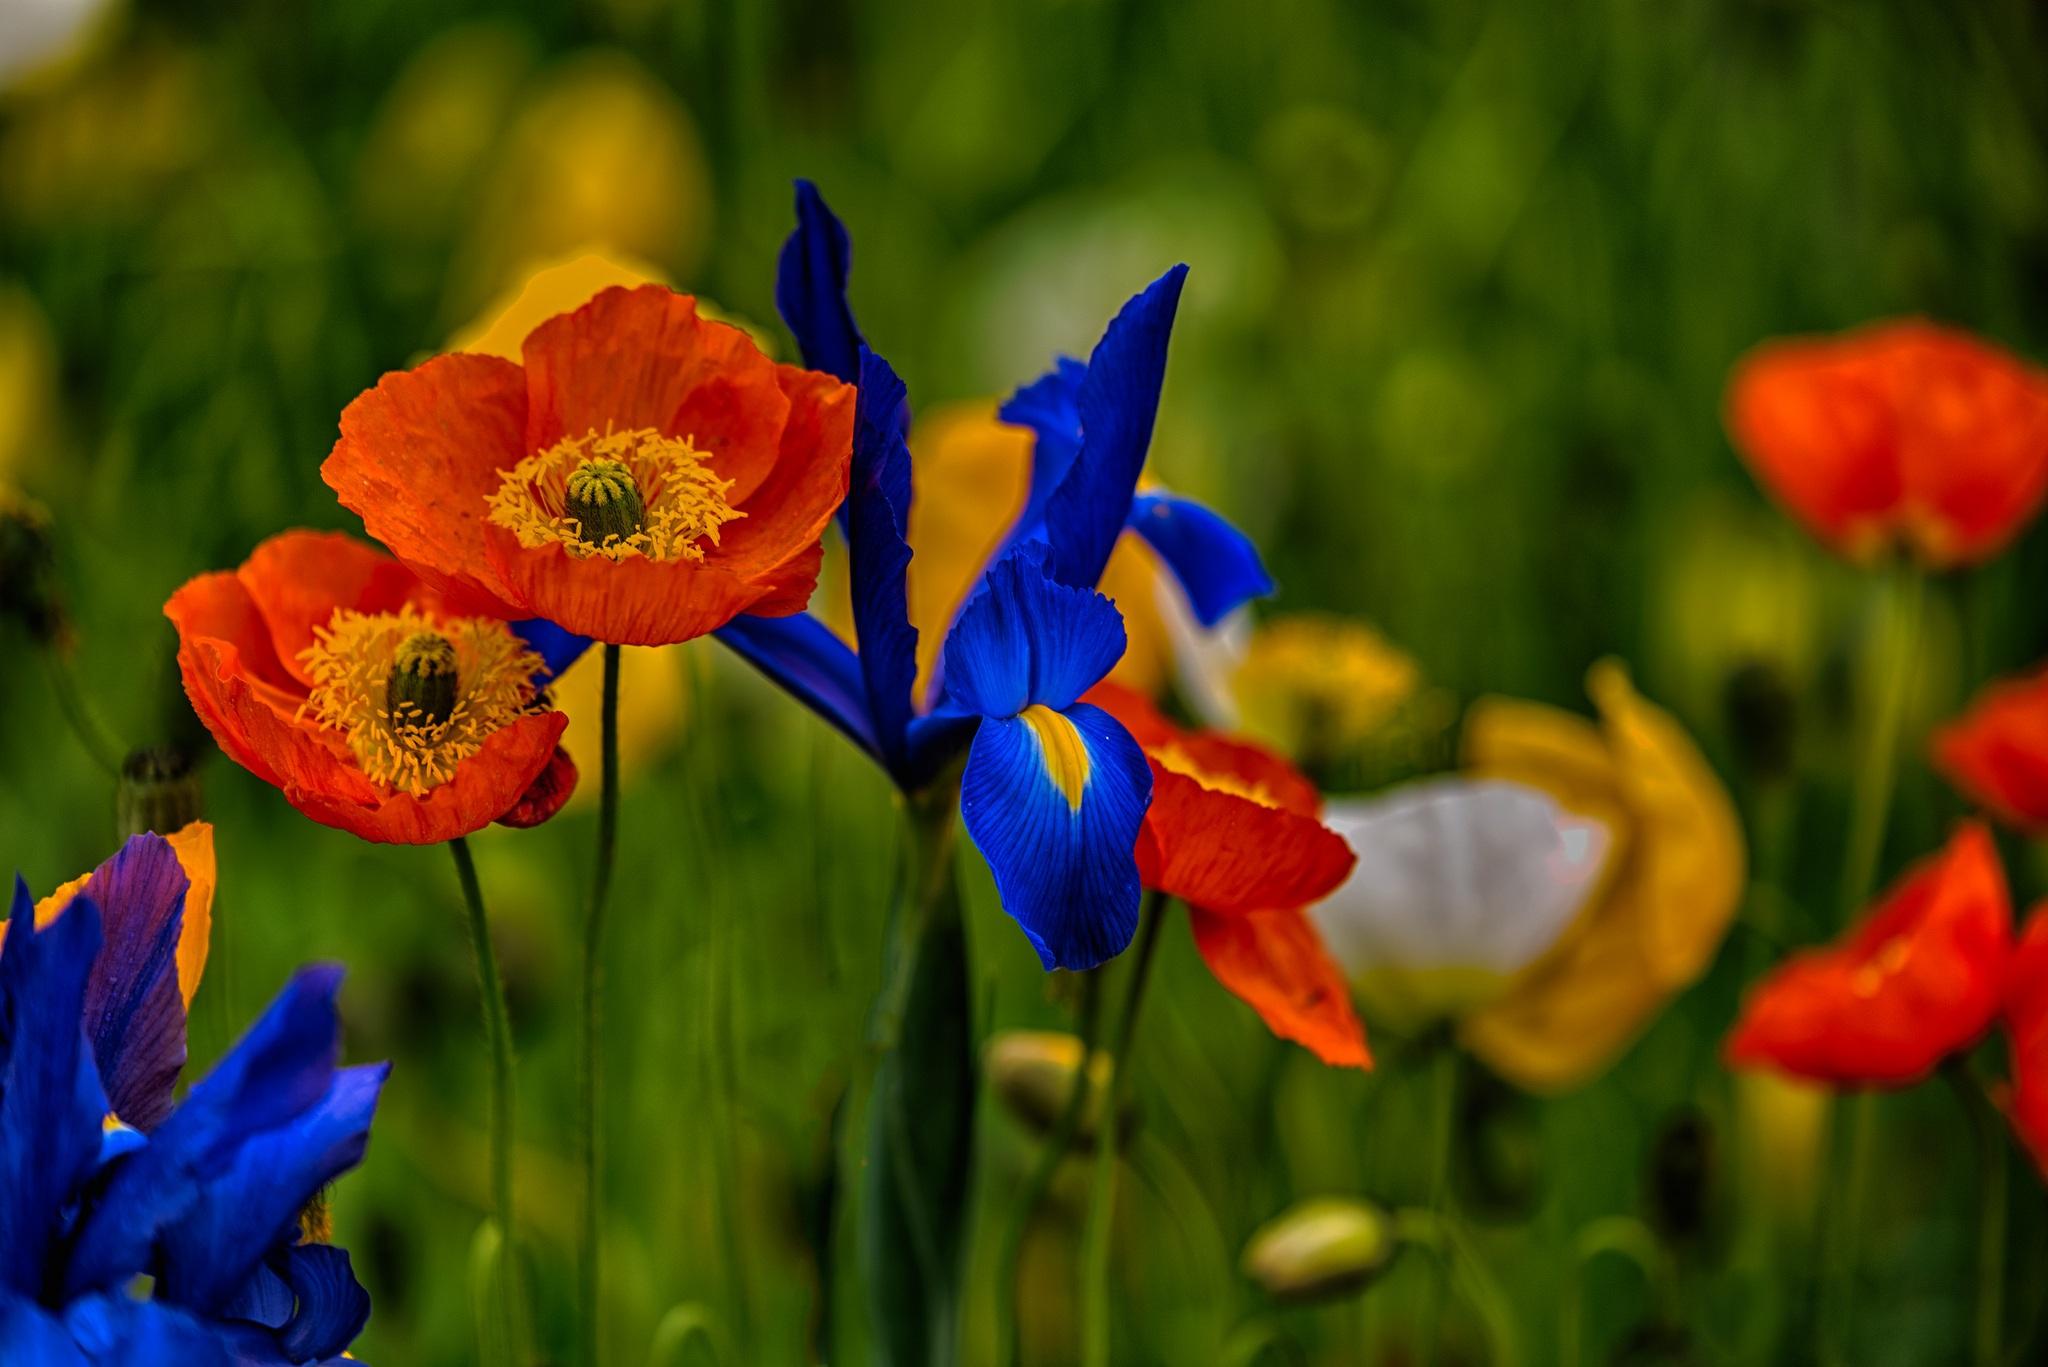 шмель,ирис,цветок,лето  № 529511 бесплатно